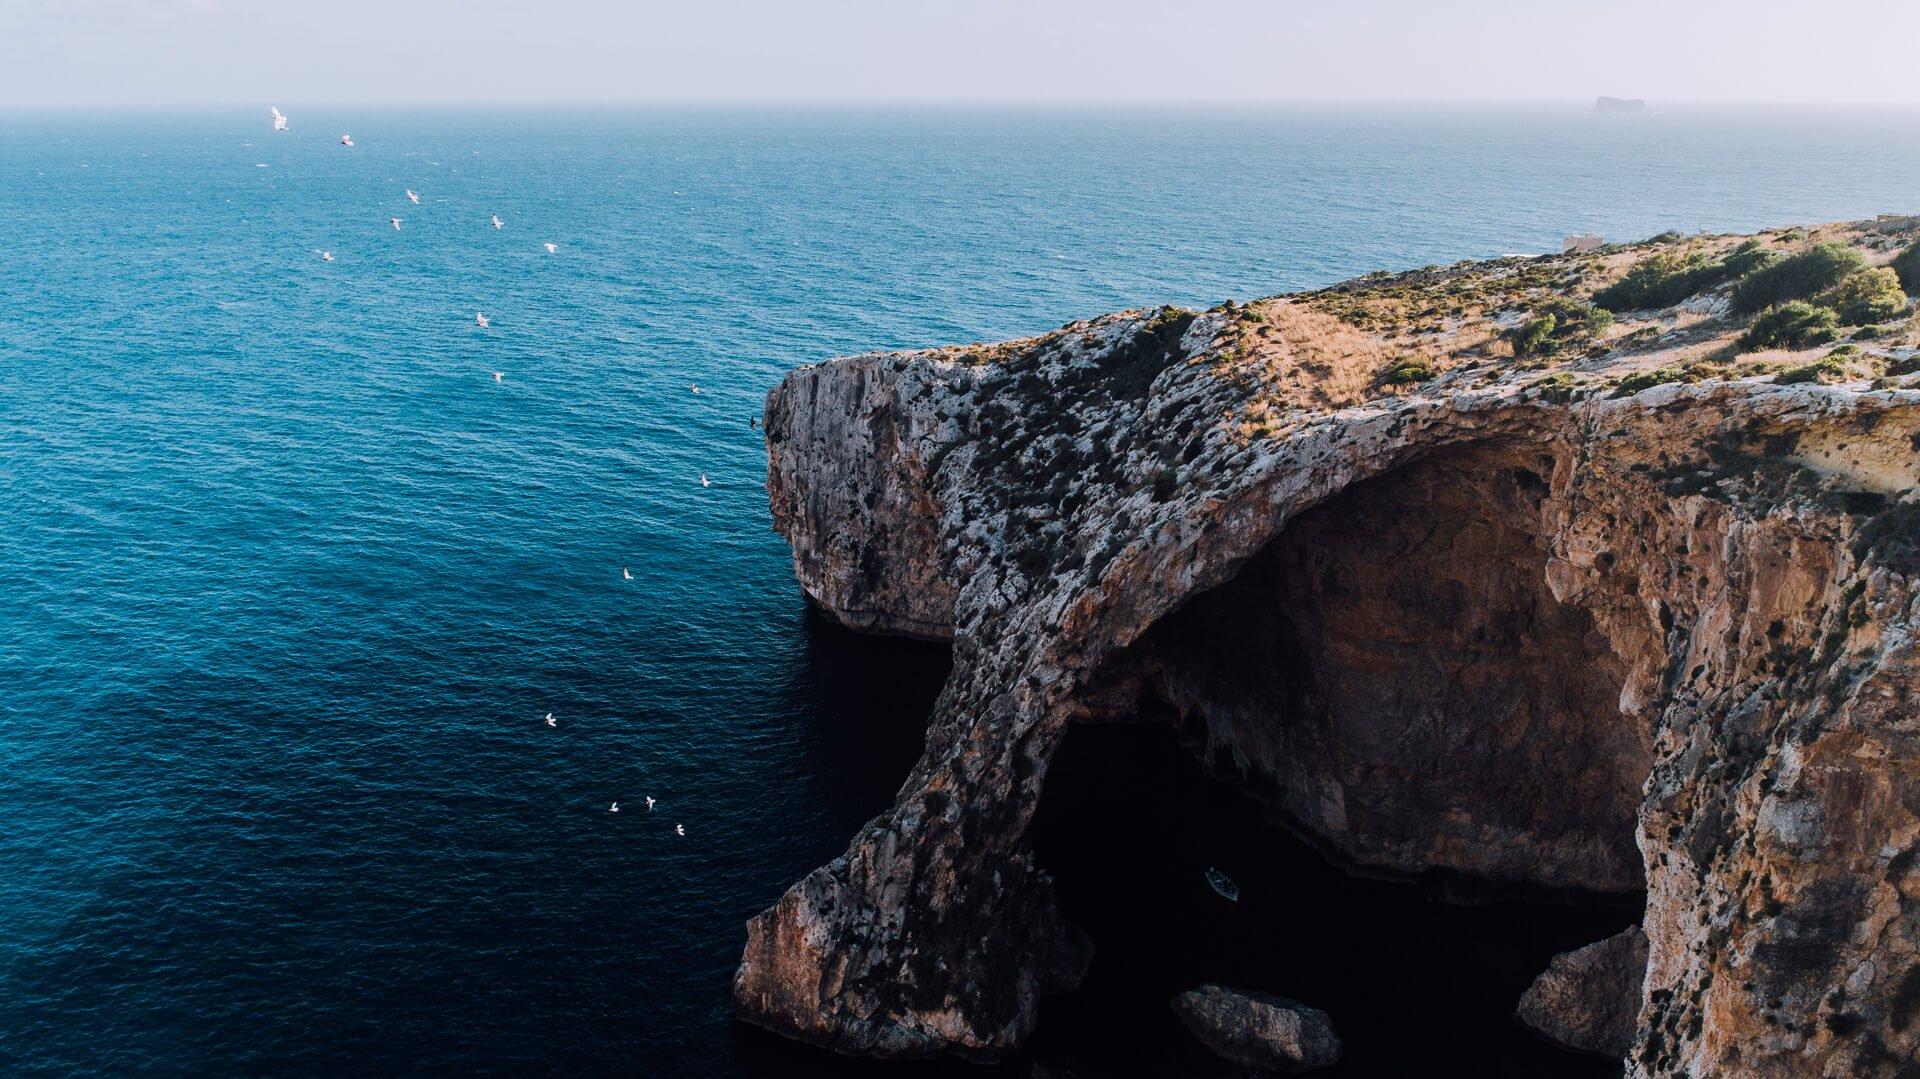 Aerial of Blue Grotto, Malta